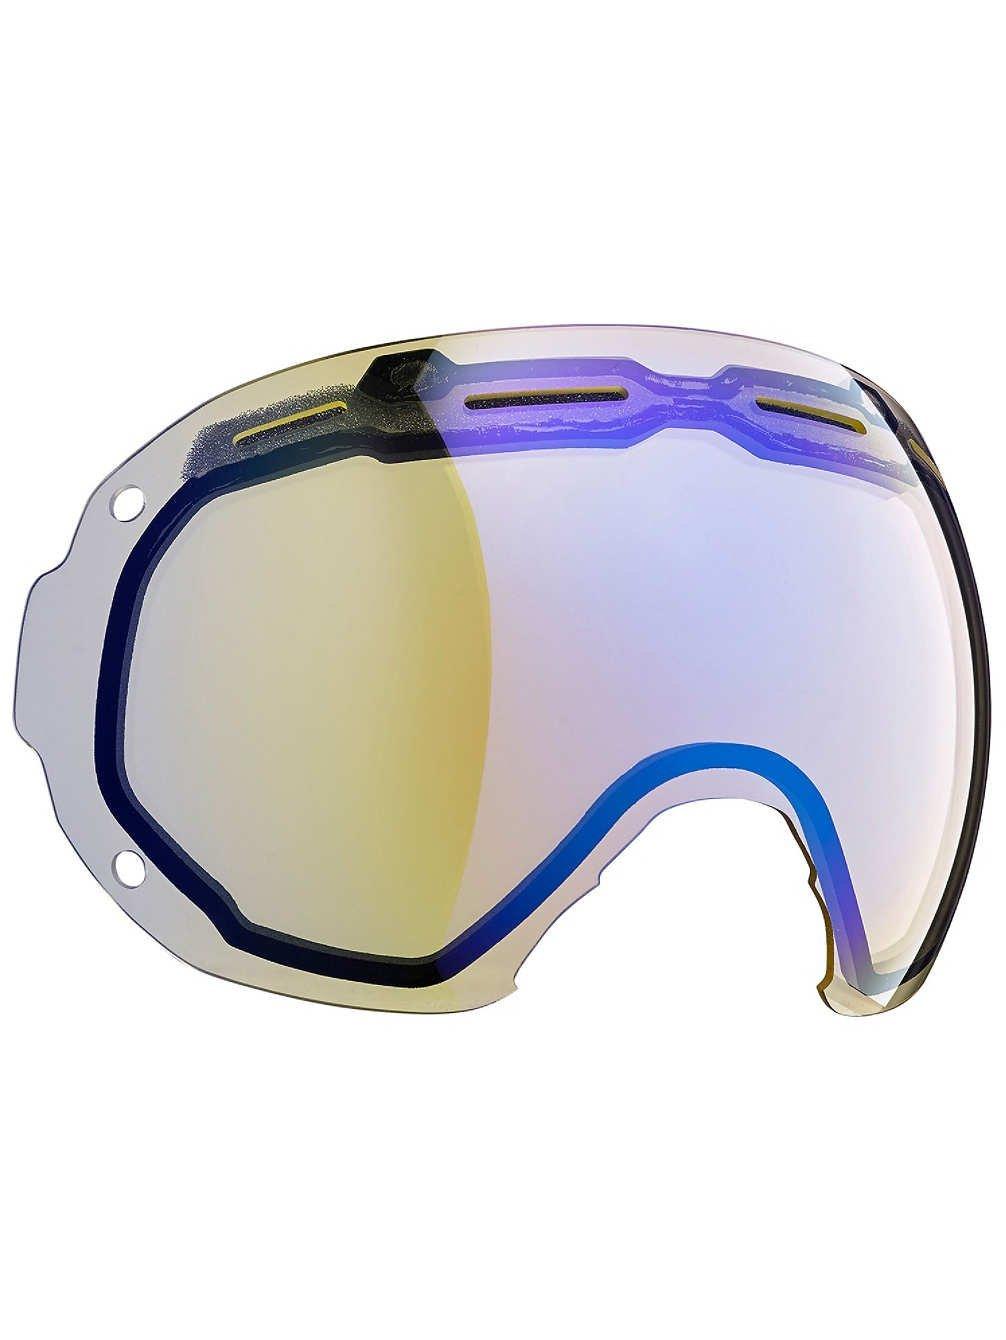 Bern 2016 / 17イーストウッド/モンロー大きなフレーム冬雪ゴーグル交換レンズ B017JOQSCS  Yellow/Blue Light Mirror One Size